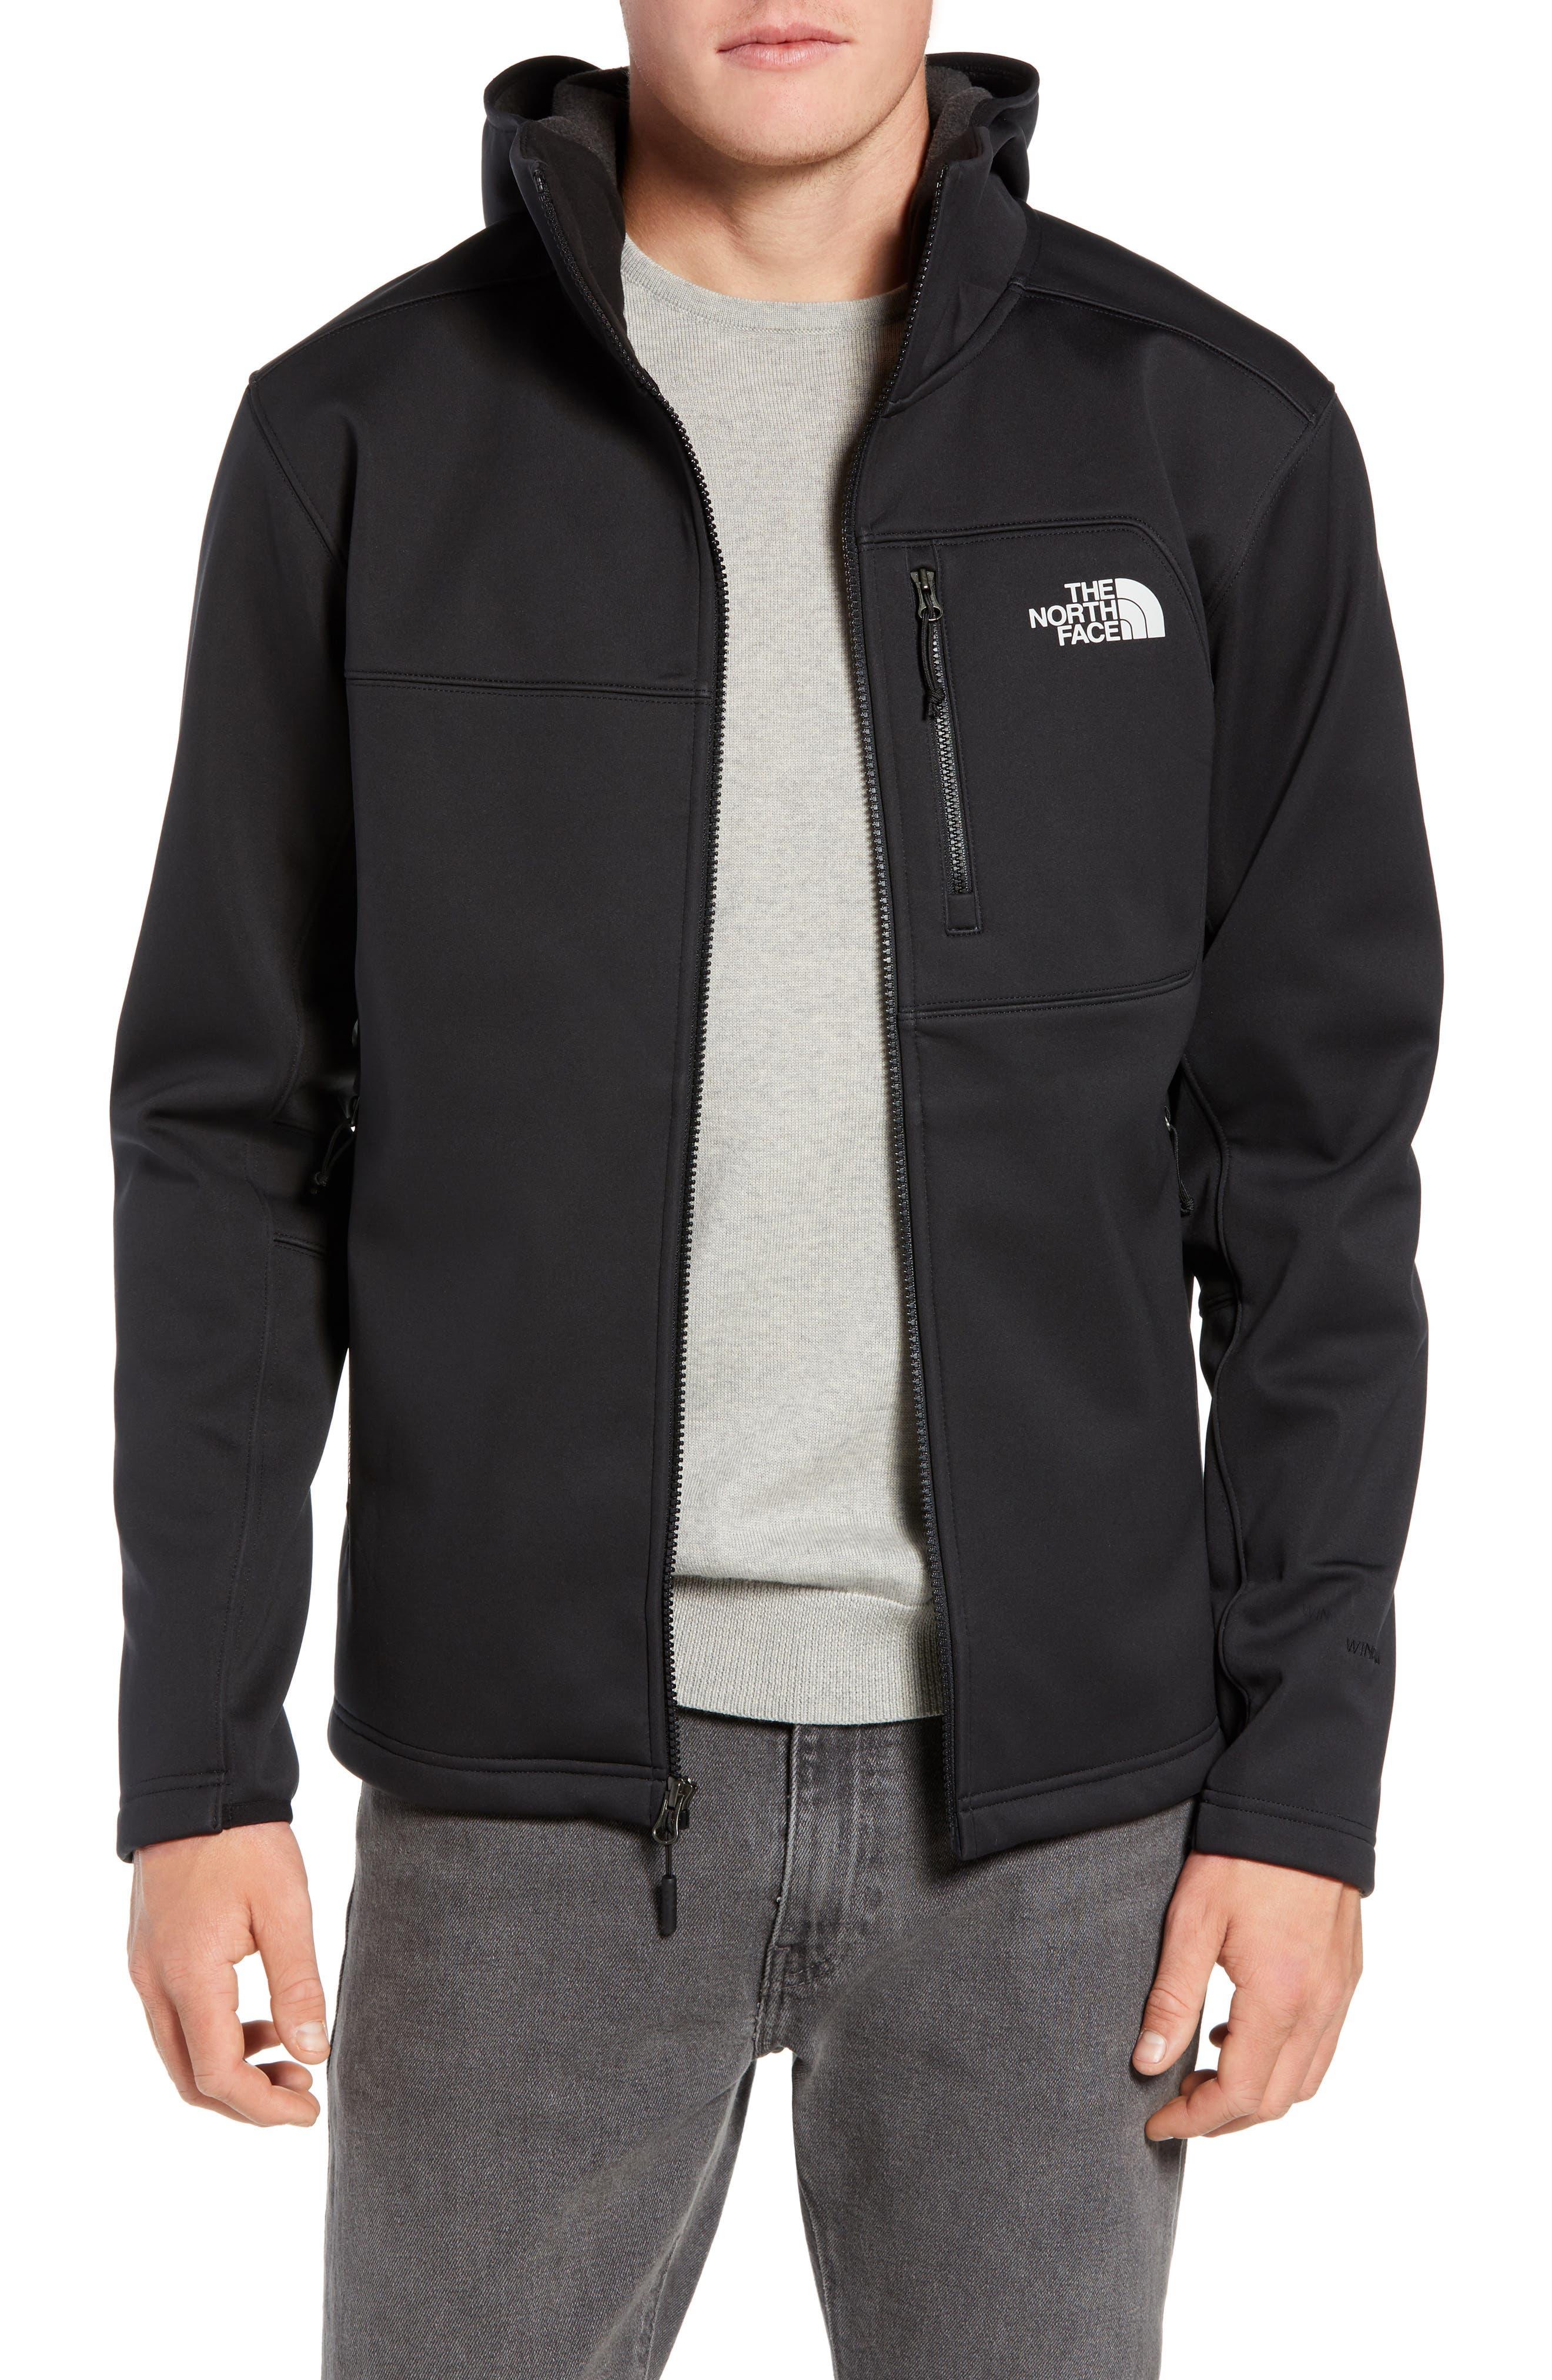 North Face Apex Risor Hooded Jacket,                             Main thumbnail 1, color,                             TNF BLACK/ TNF BLACK